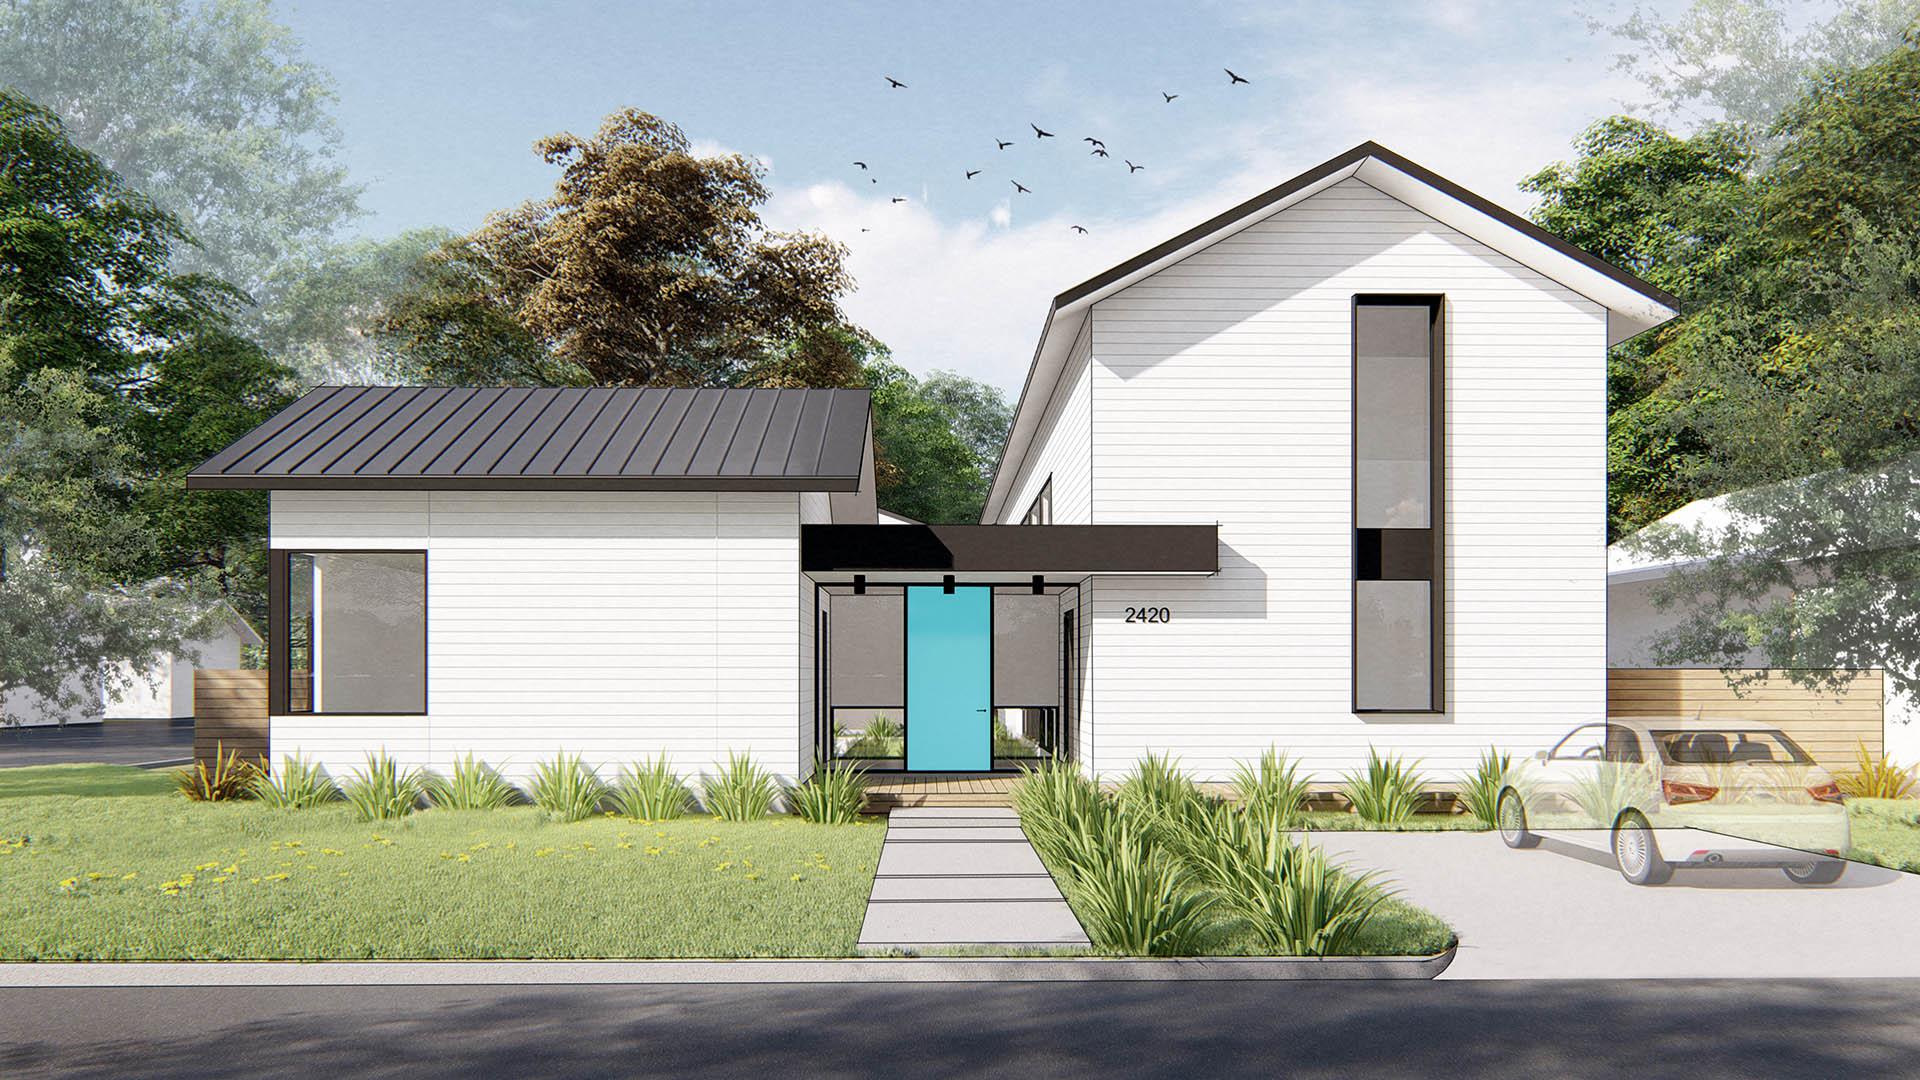 Baylor property image